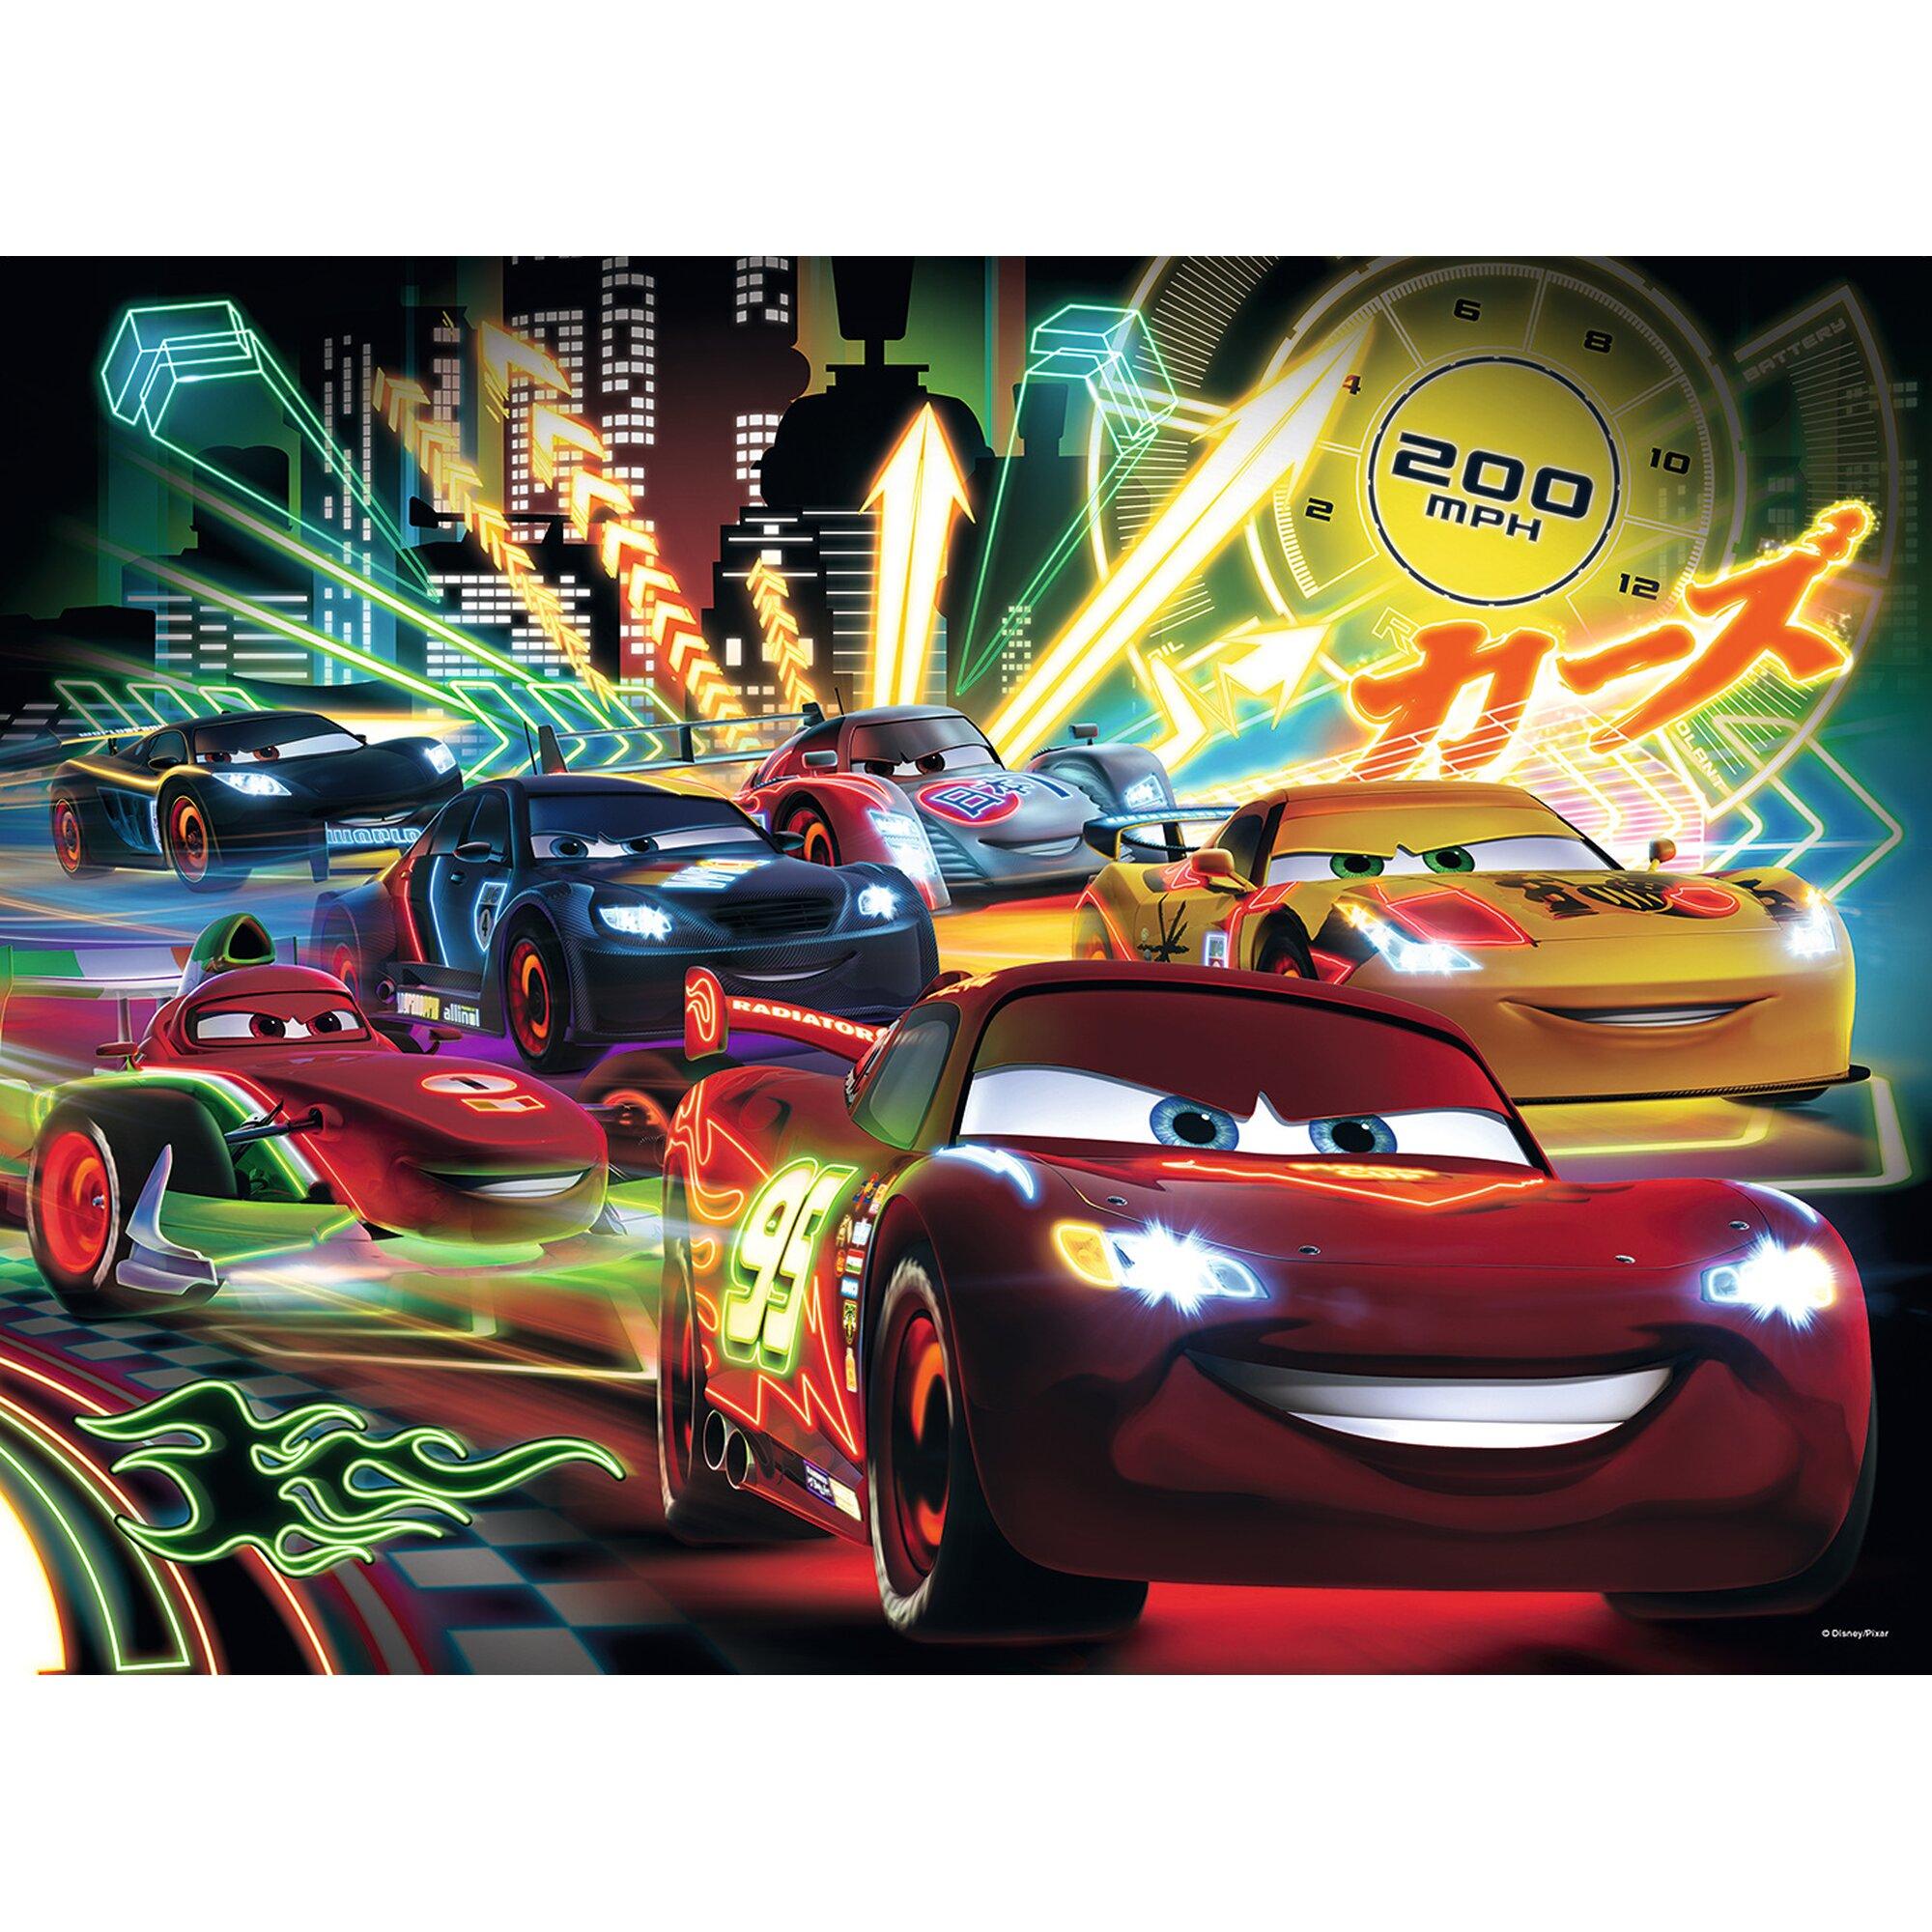 ravensburger-kinderpuzzle-im-xxl-format-100-teile-cars-neon